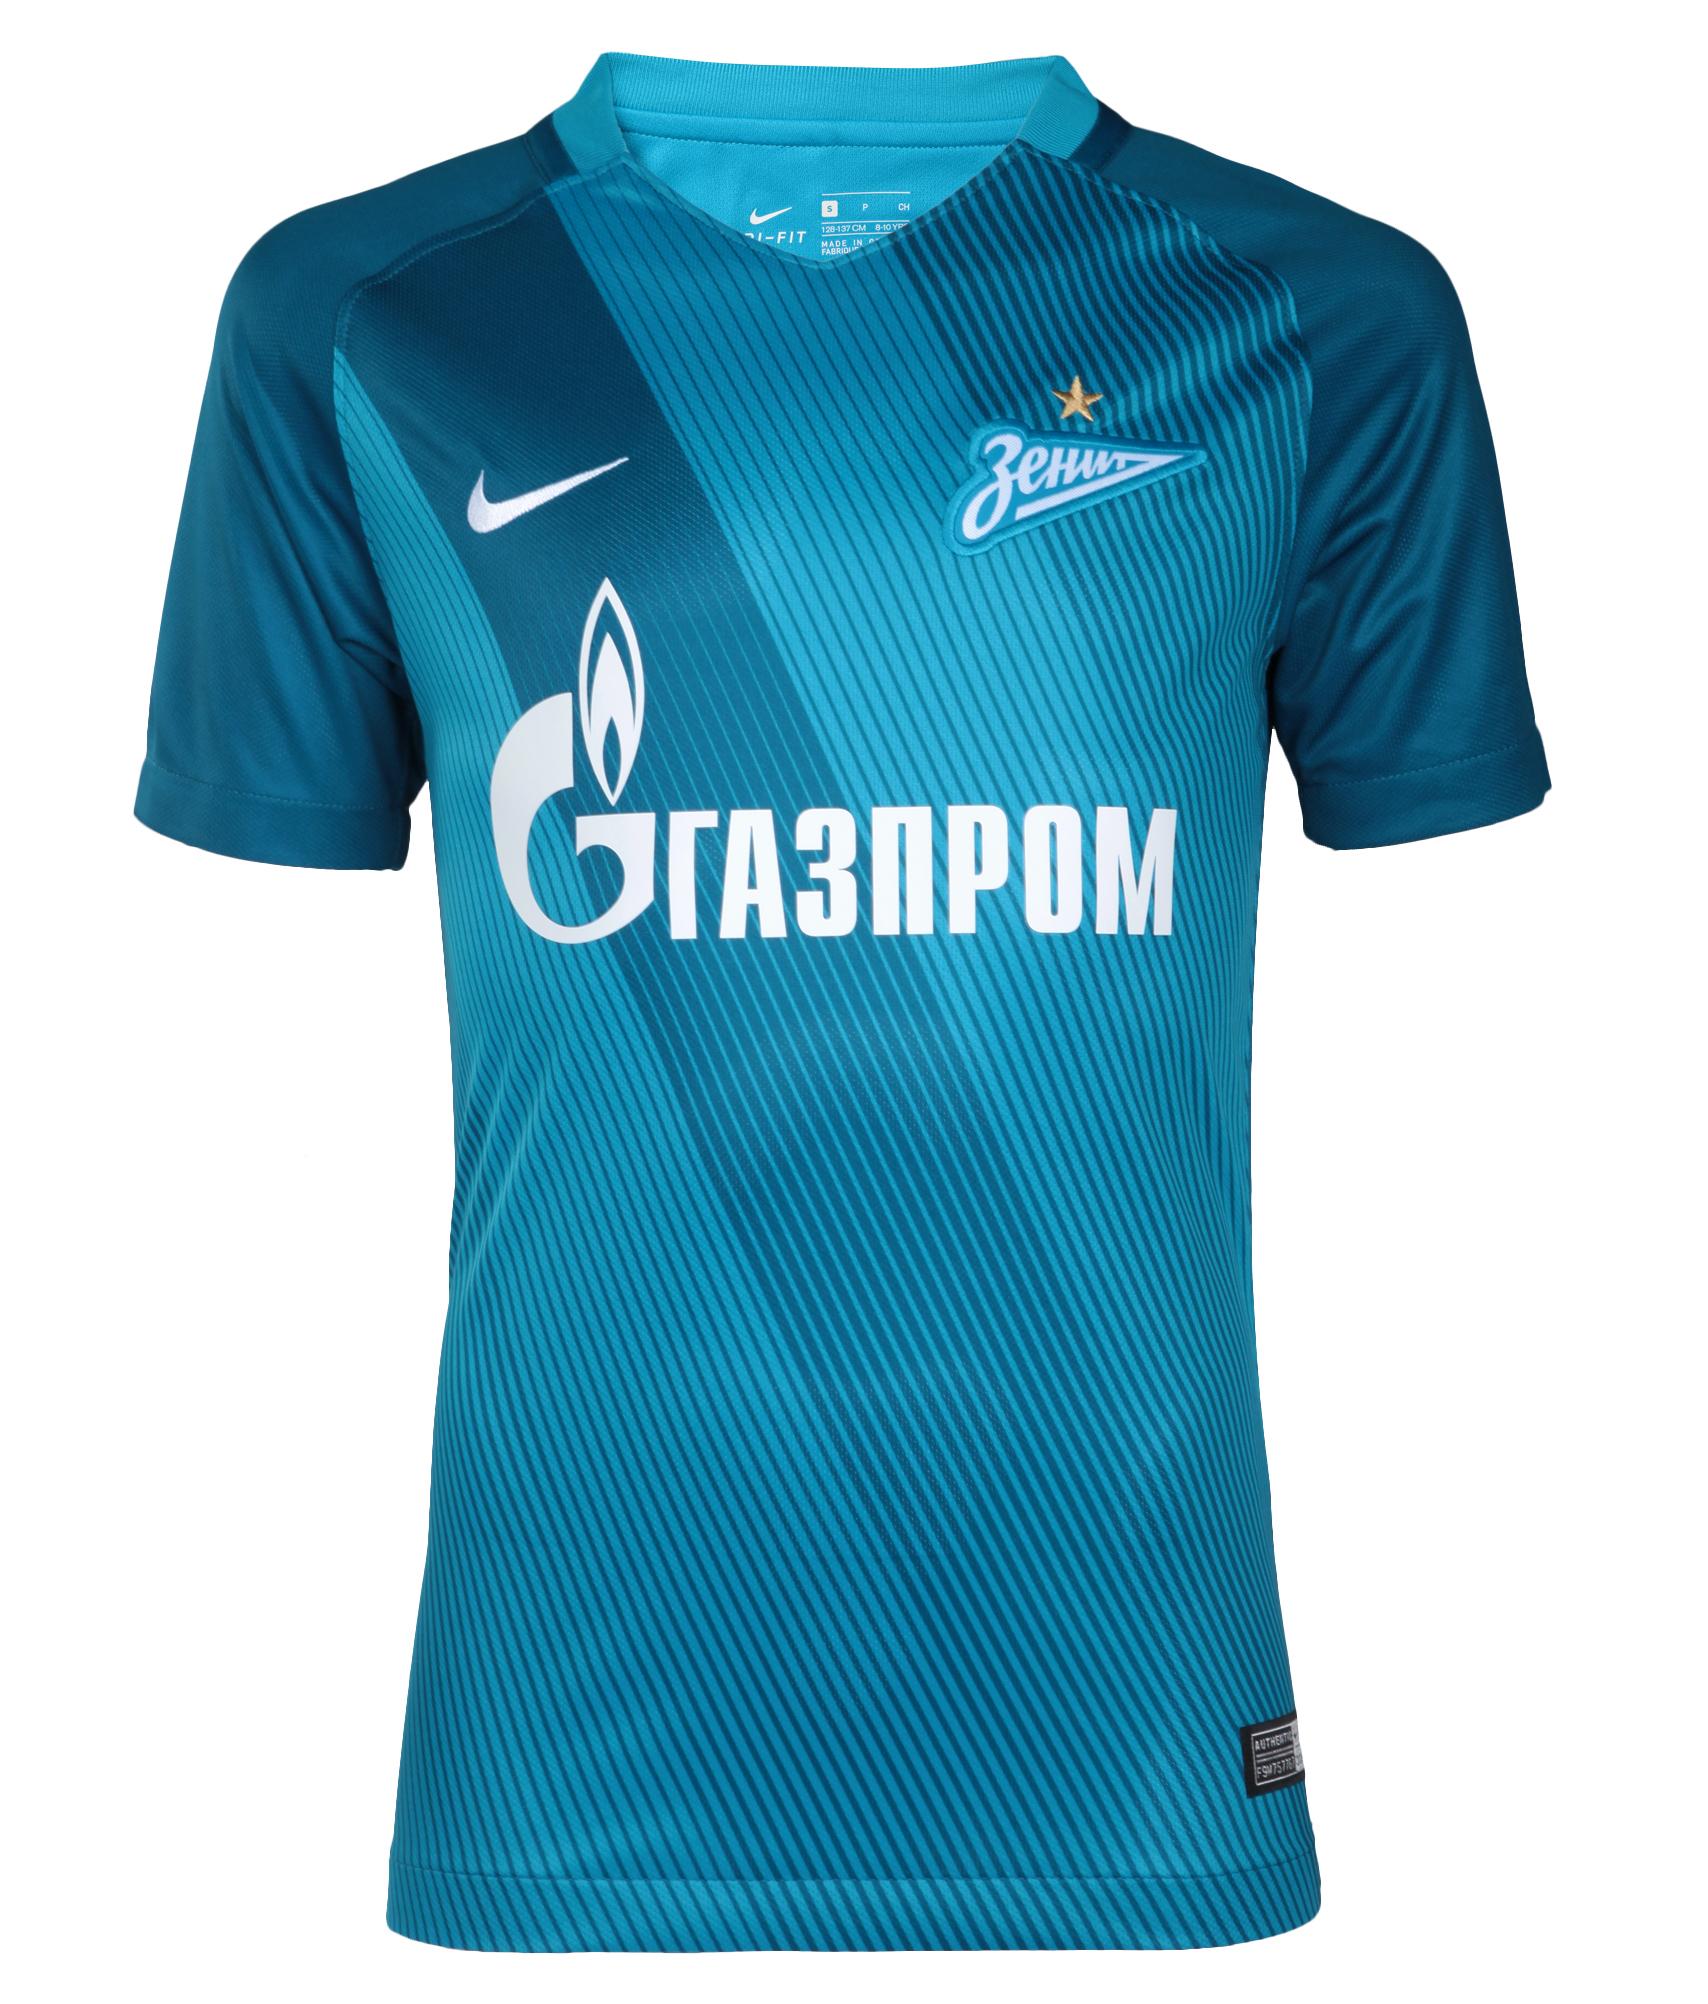 Подростковая домашняя футболка, Цвет-Синий, Размер-S